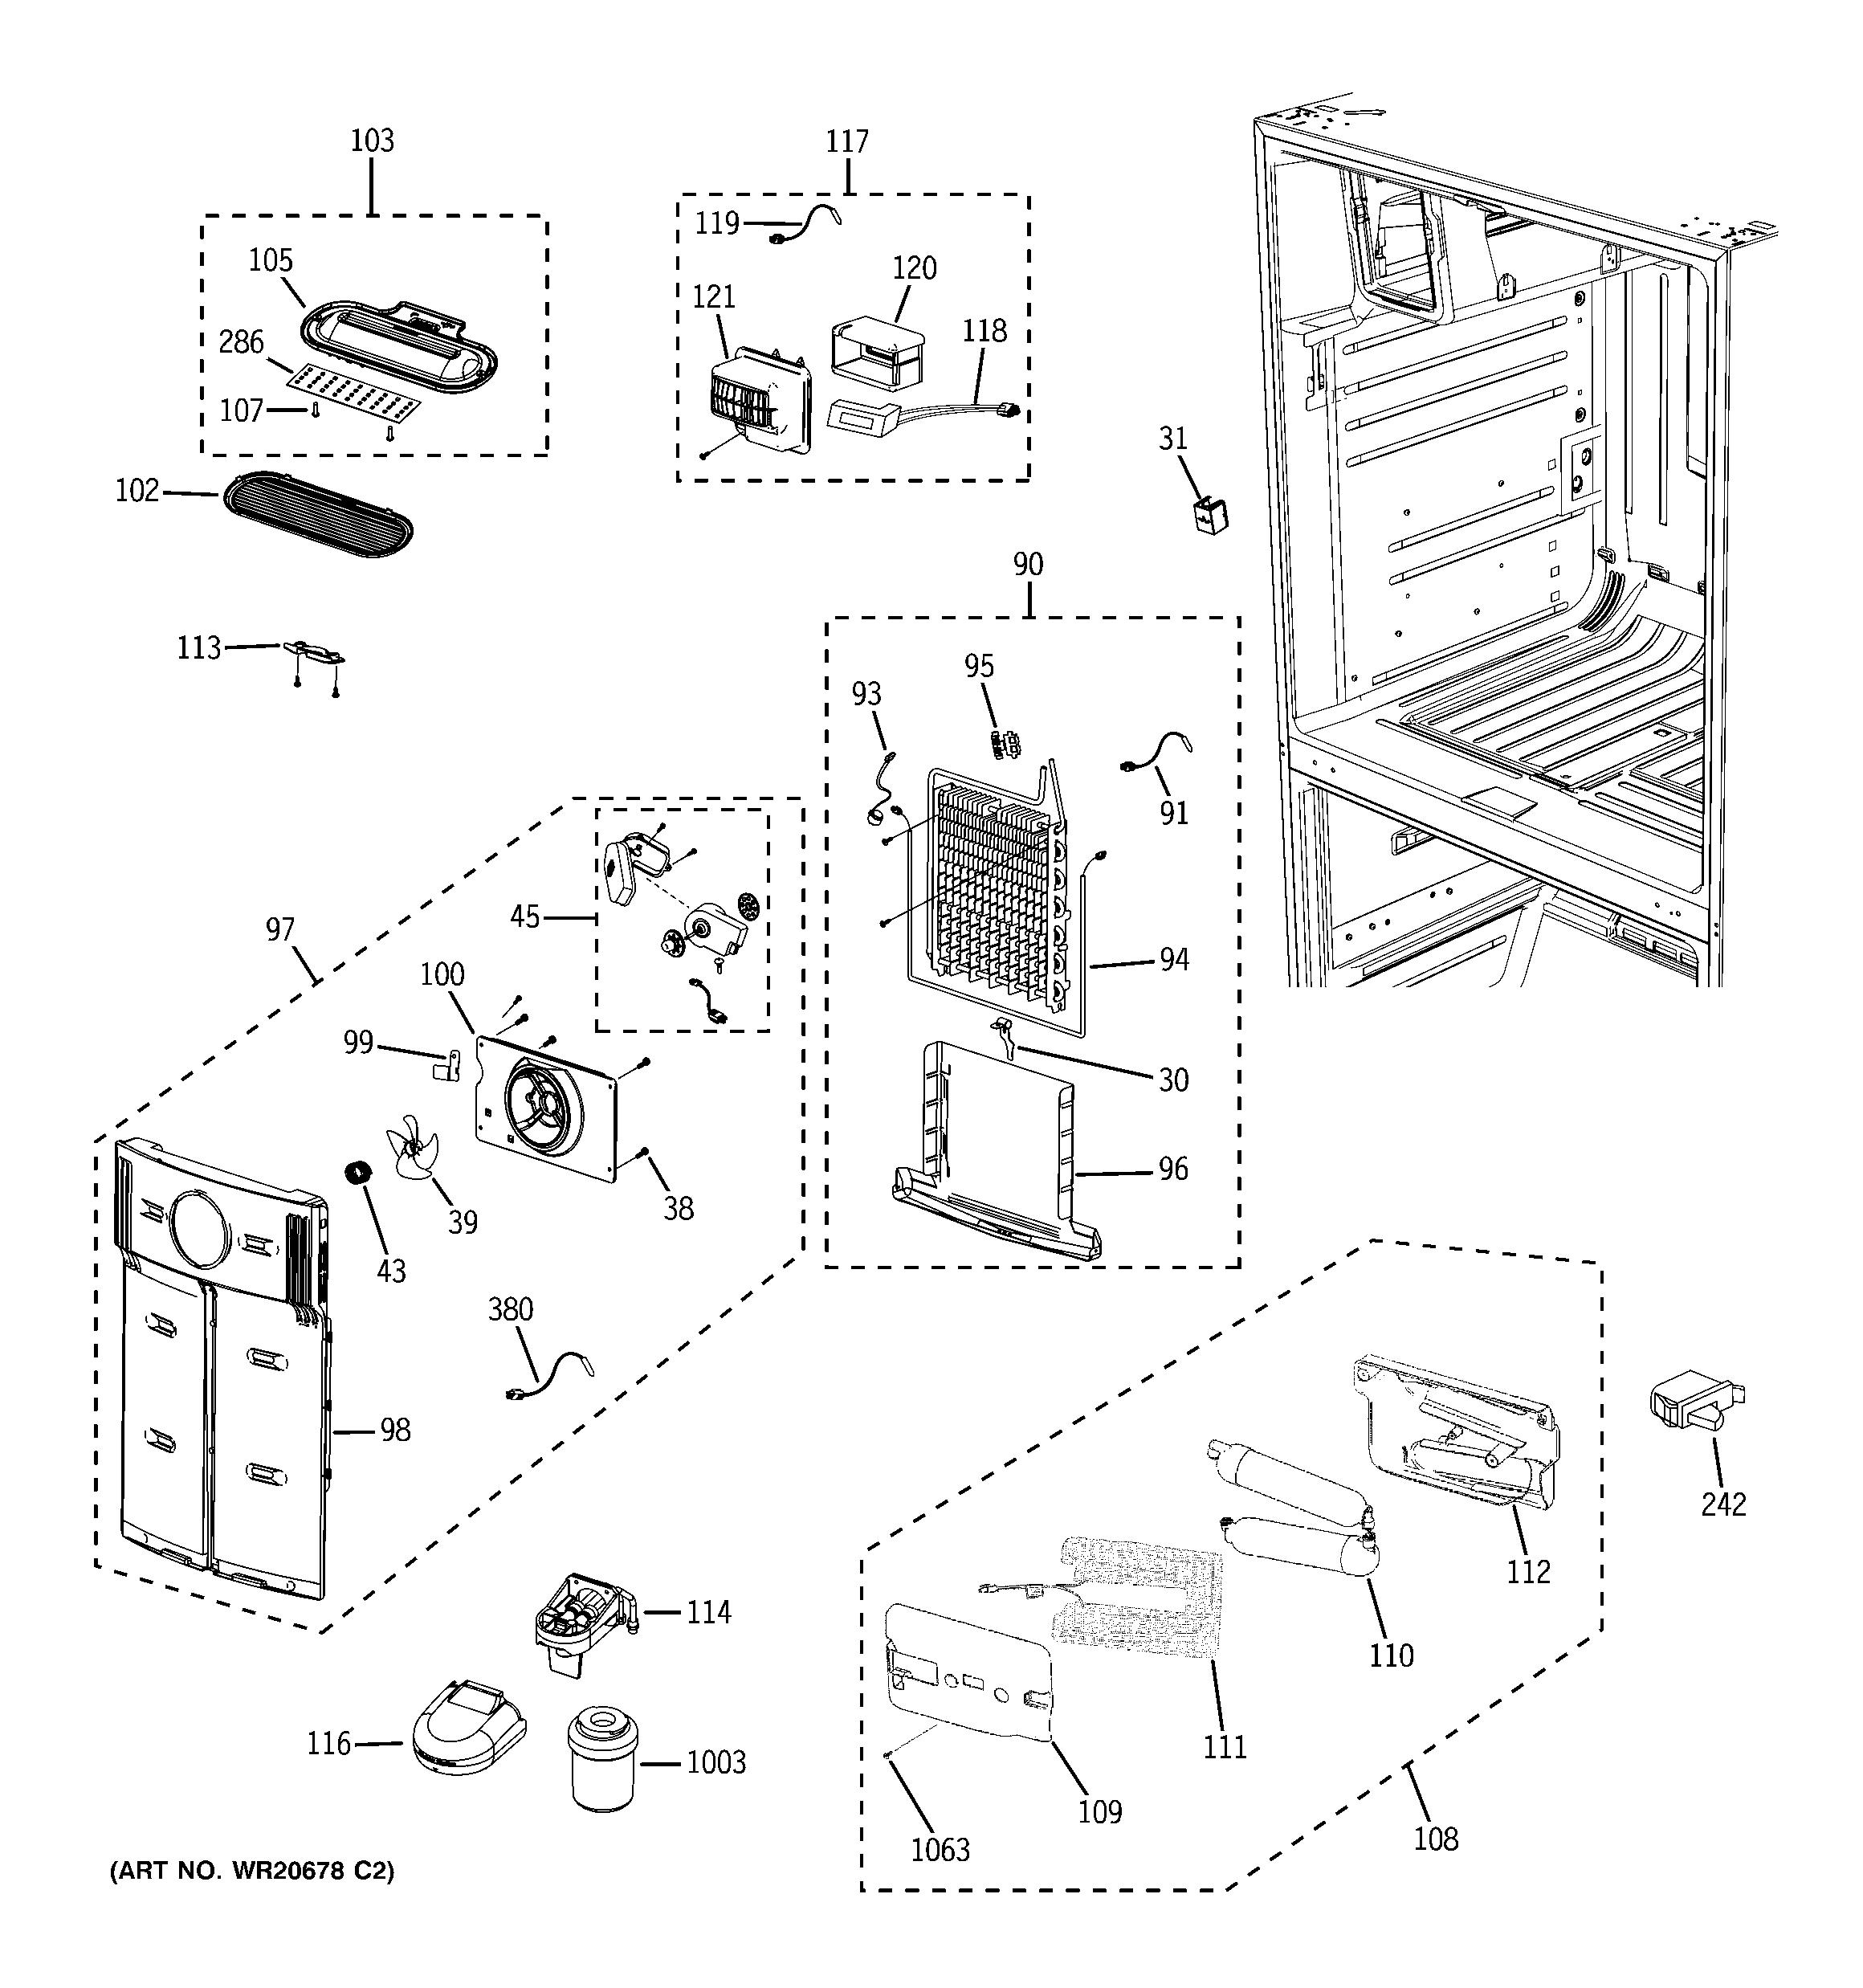 Ge Refrigerator Wiring Diagram Pfss6pkxcss Sxs Model Bottom Mount Genuine Parts Number List